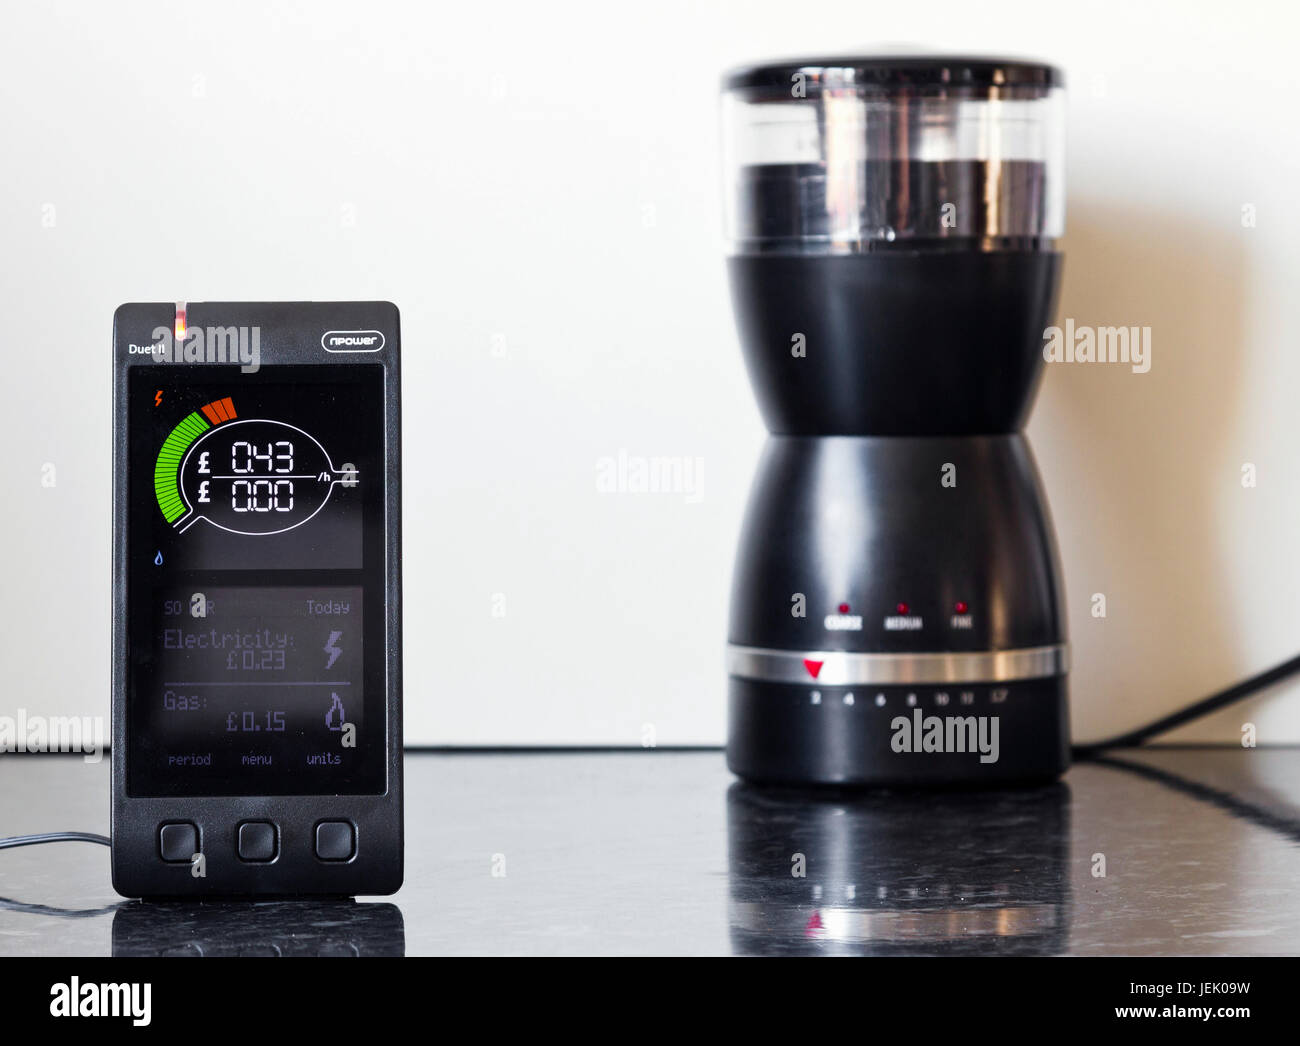 Npower smart meter home display - Stock Image